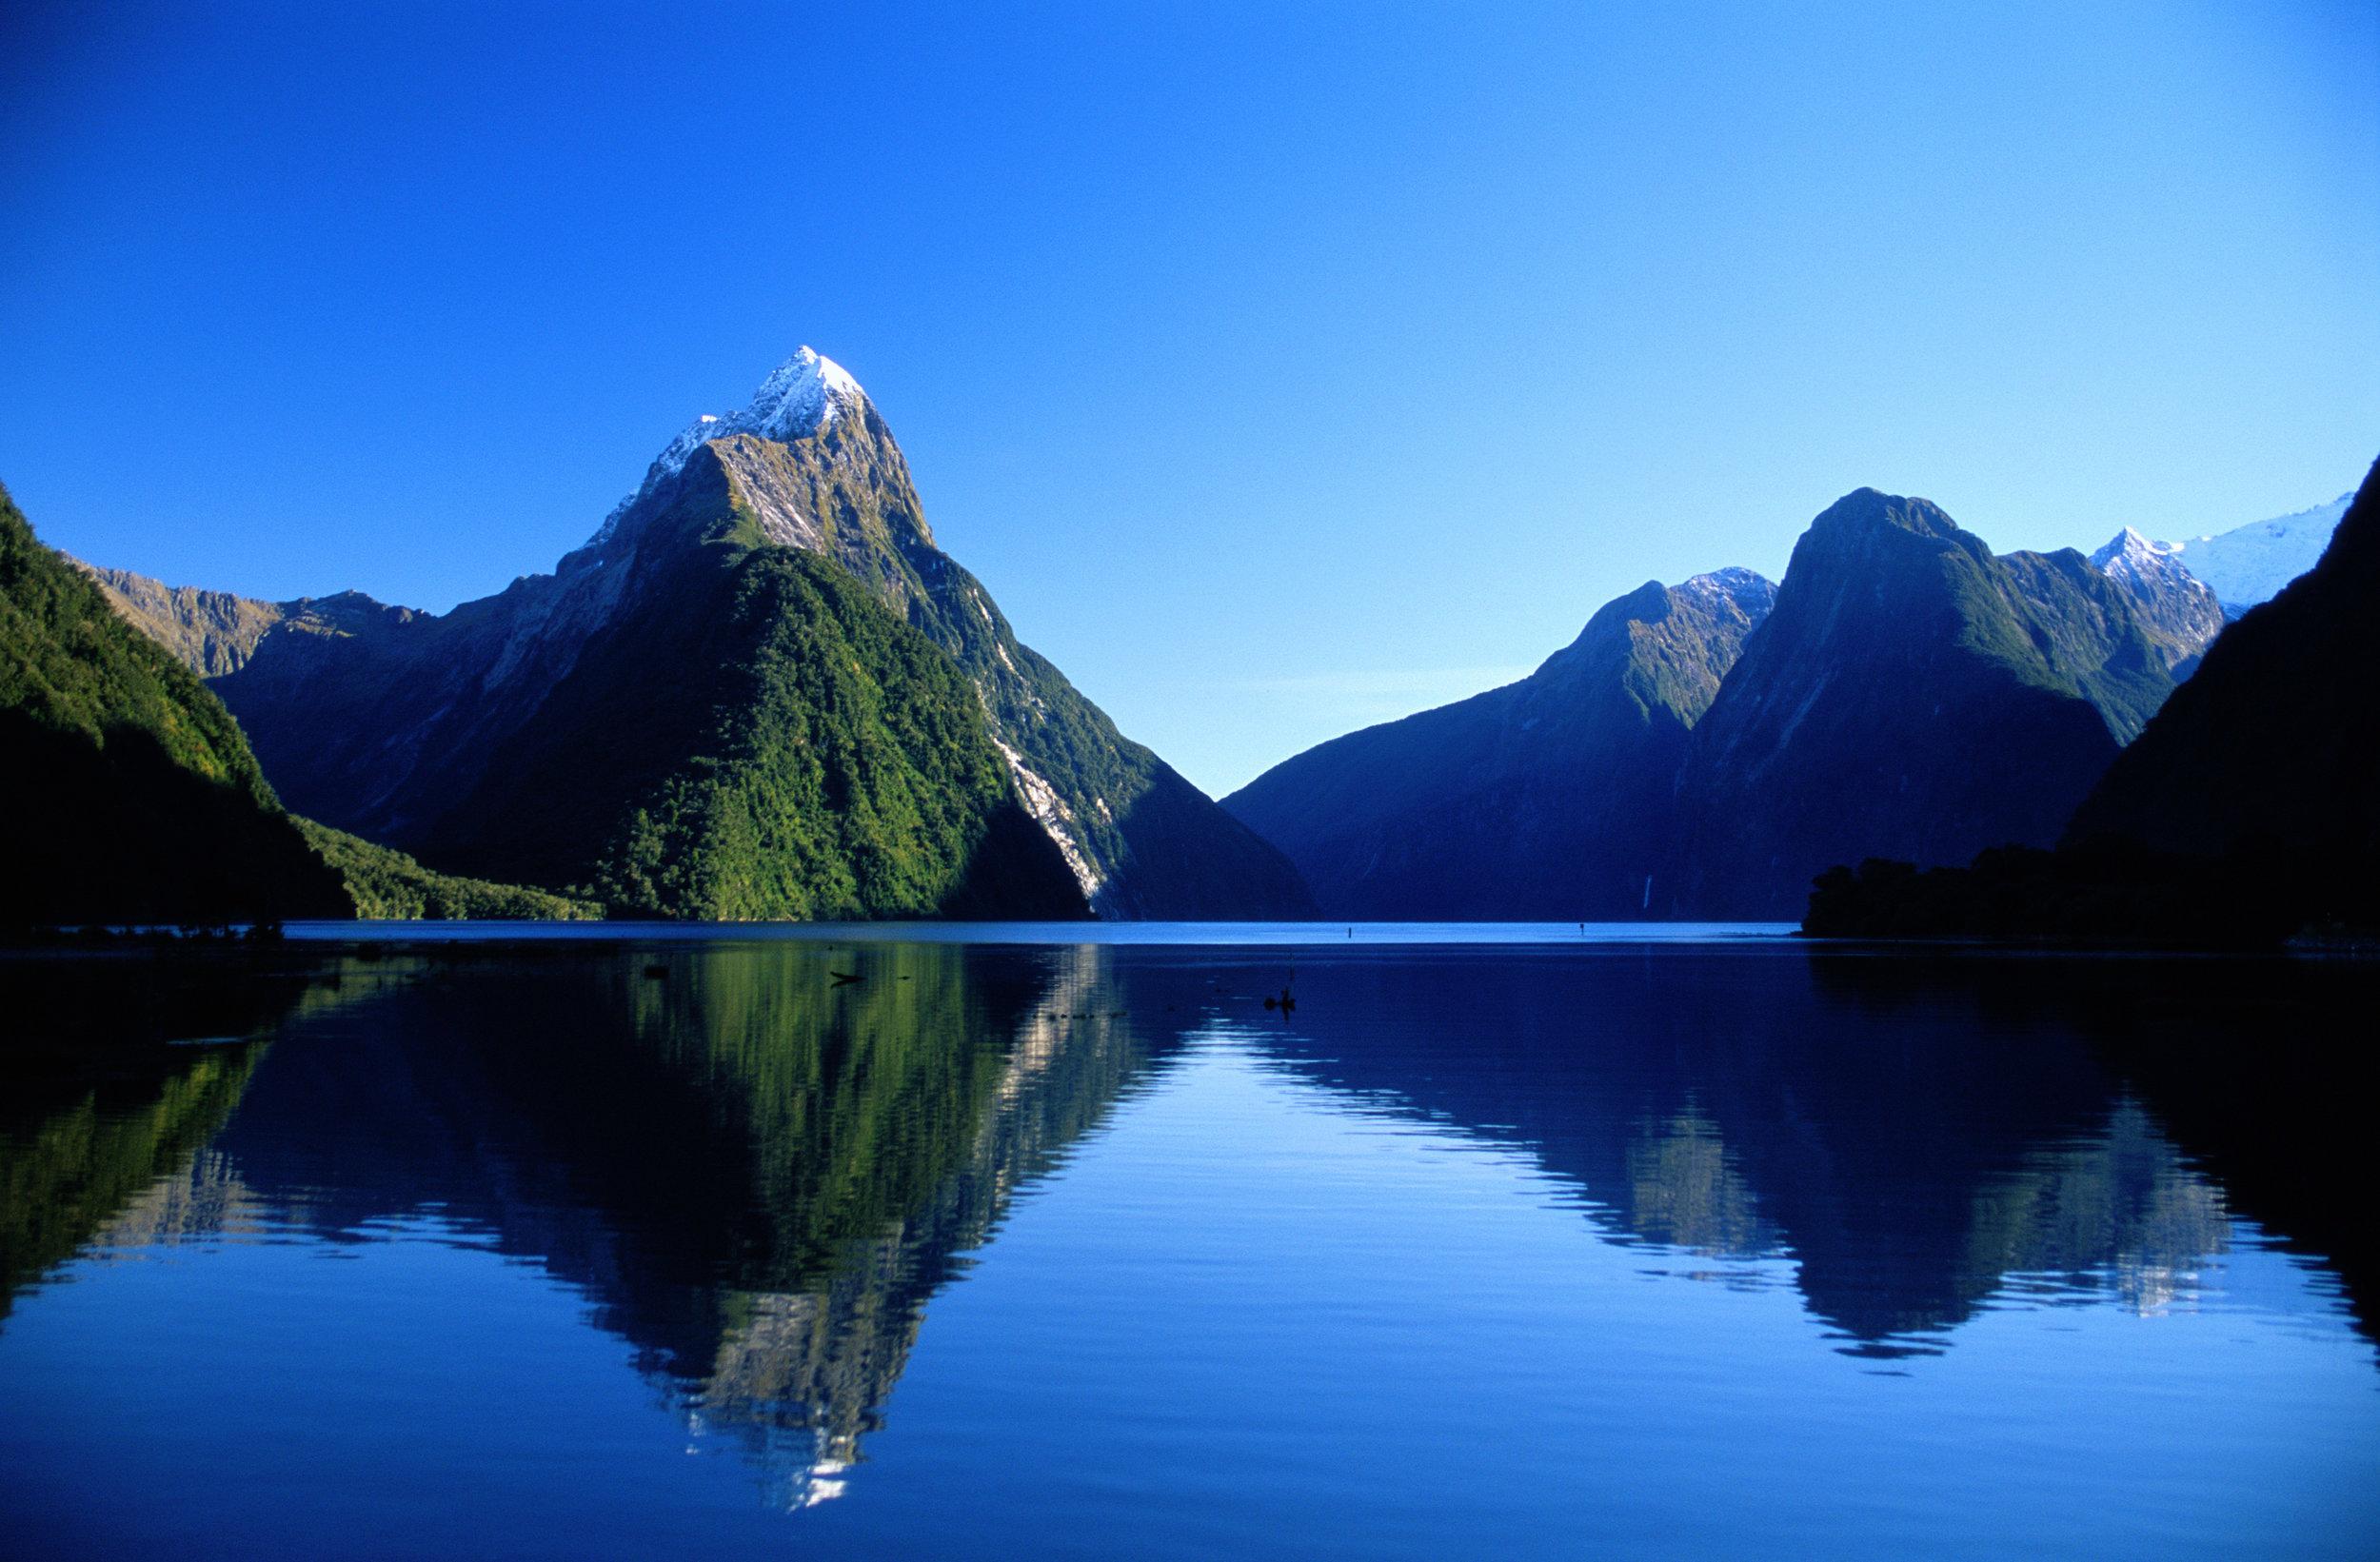 Mitre Peak, Milford Sound, Fiordland, New Zealand - credit DF.jpg